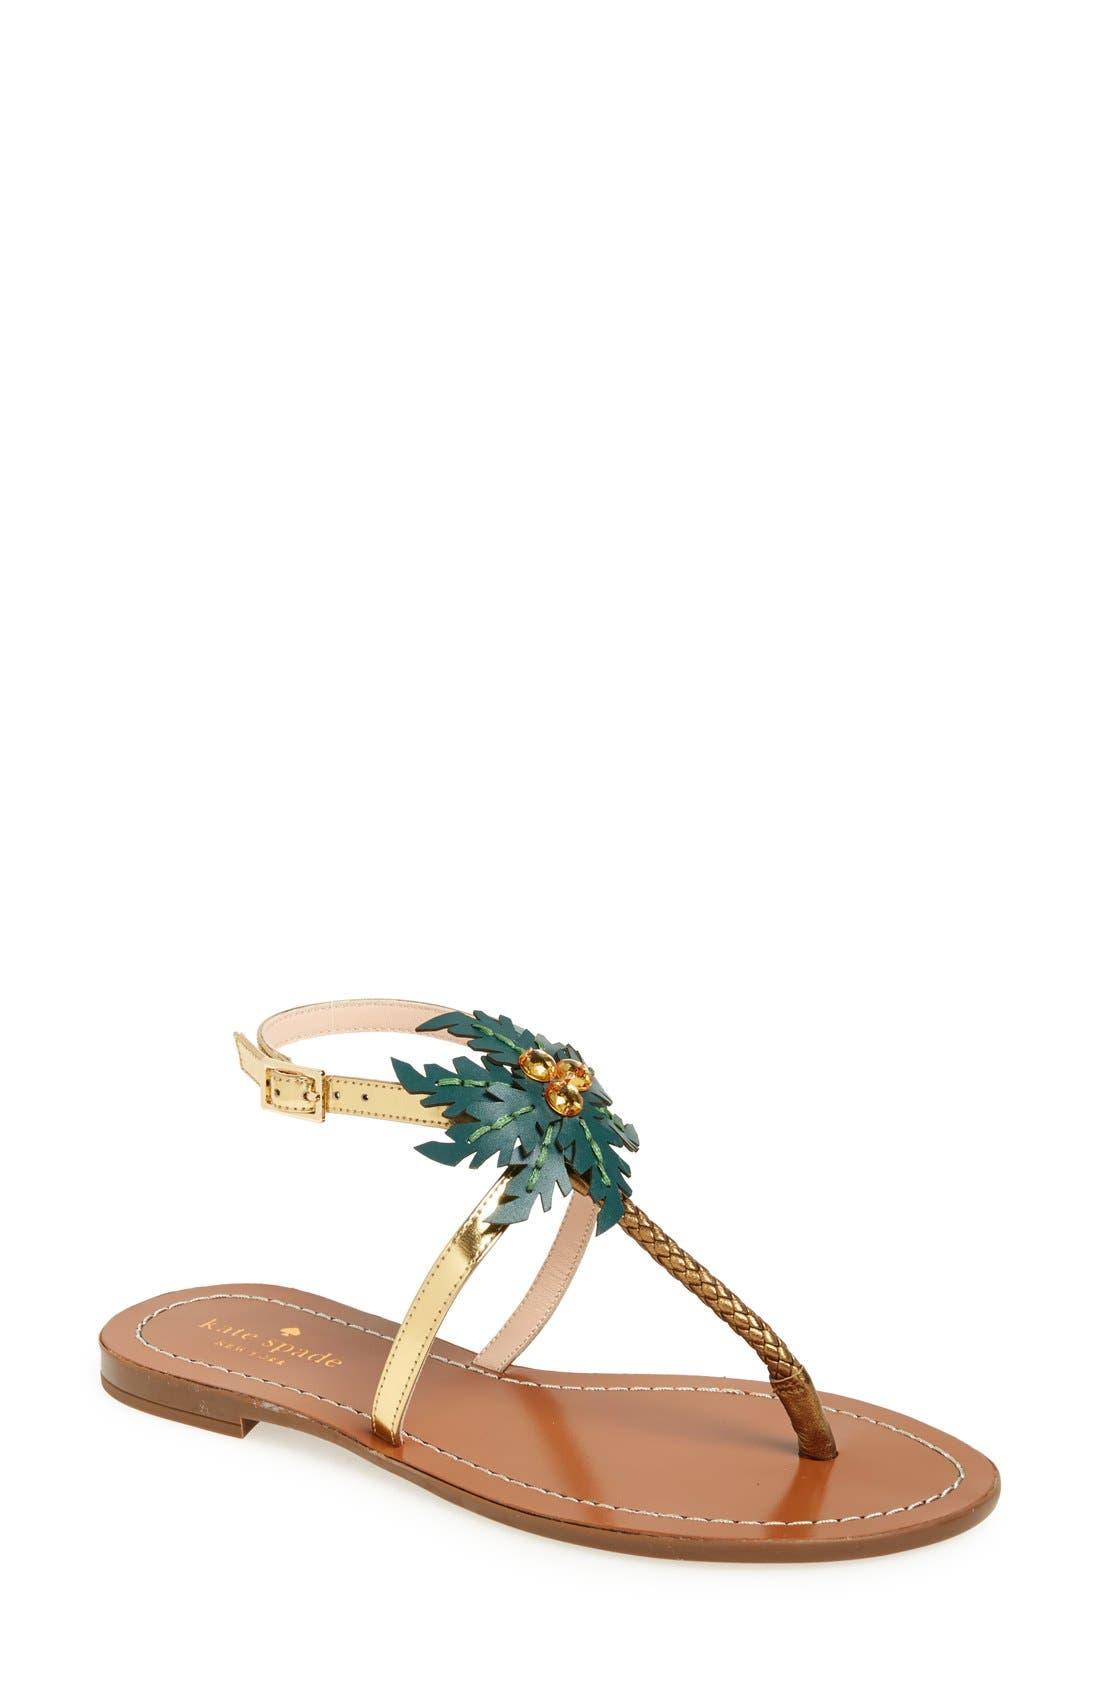 Main Image - kate spade new york 'solana' palm tree sandal (Women)